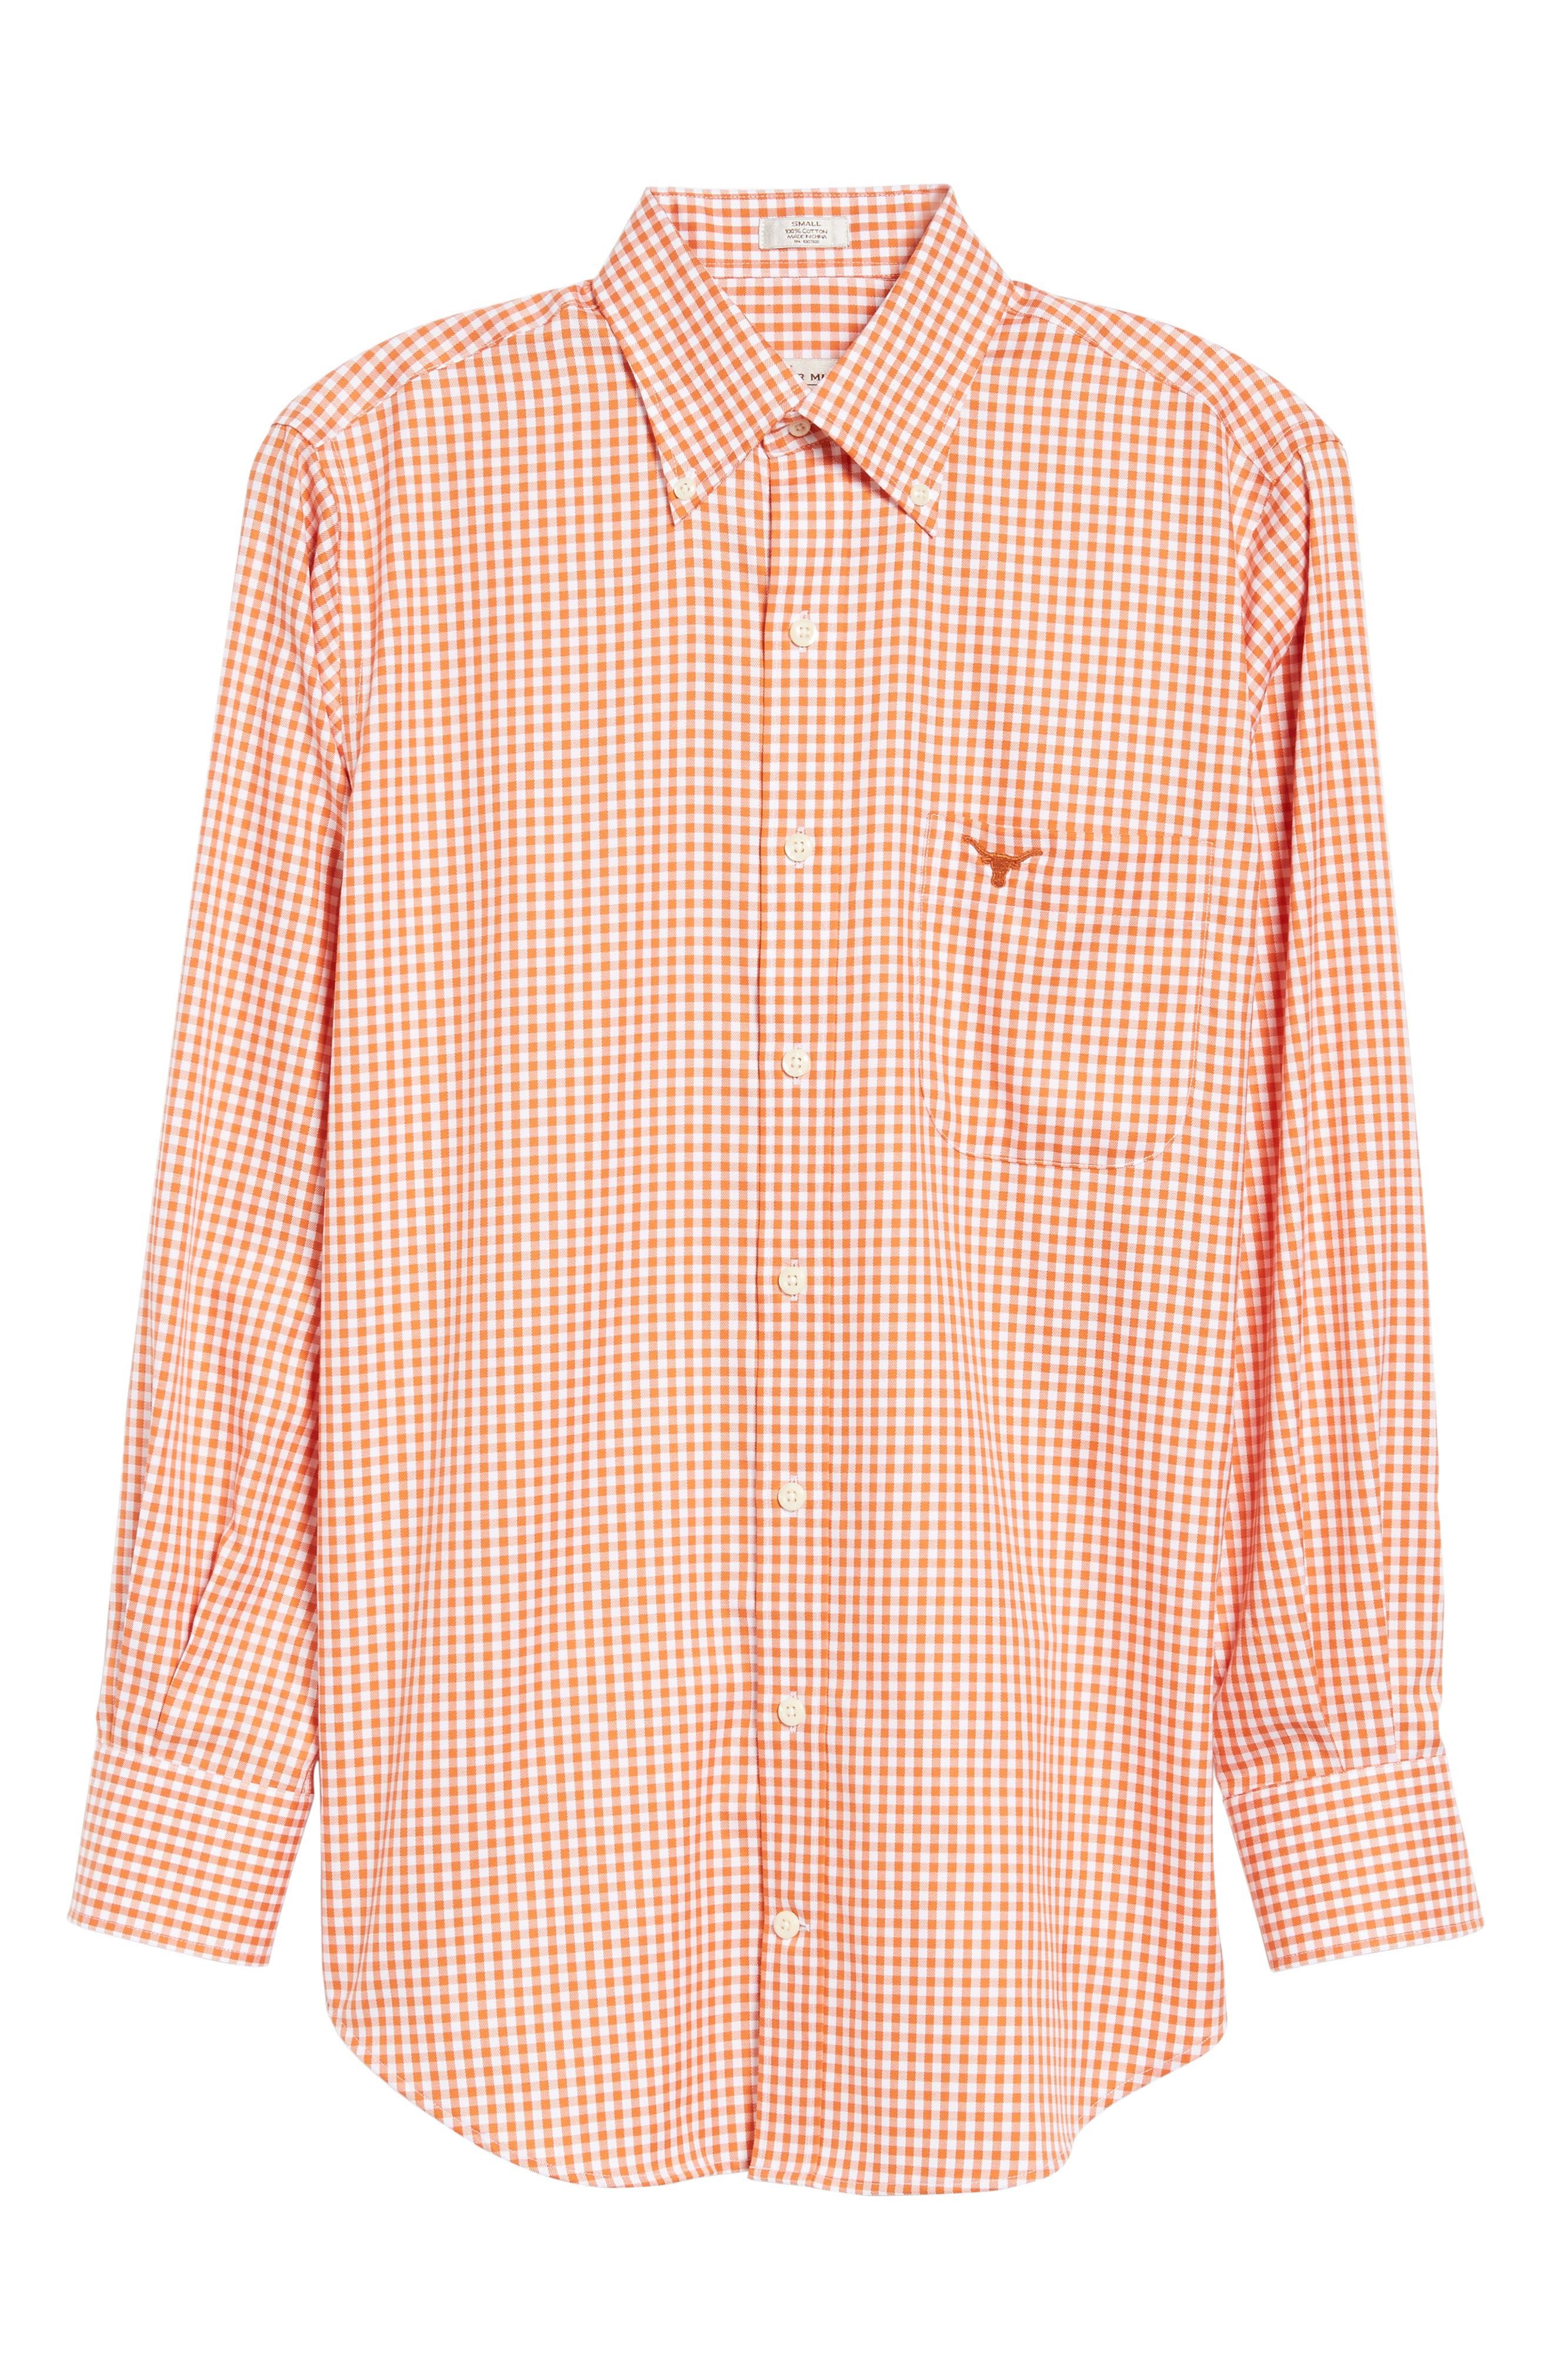 Texas Regular Fit Microcheck Sport Shirt,                             Alternate thumbnail 6, color,                             Rust